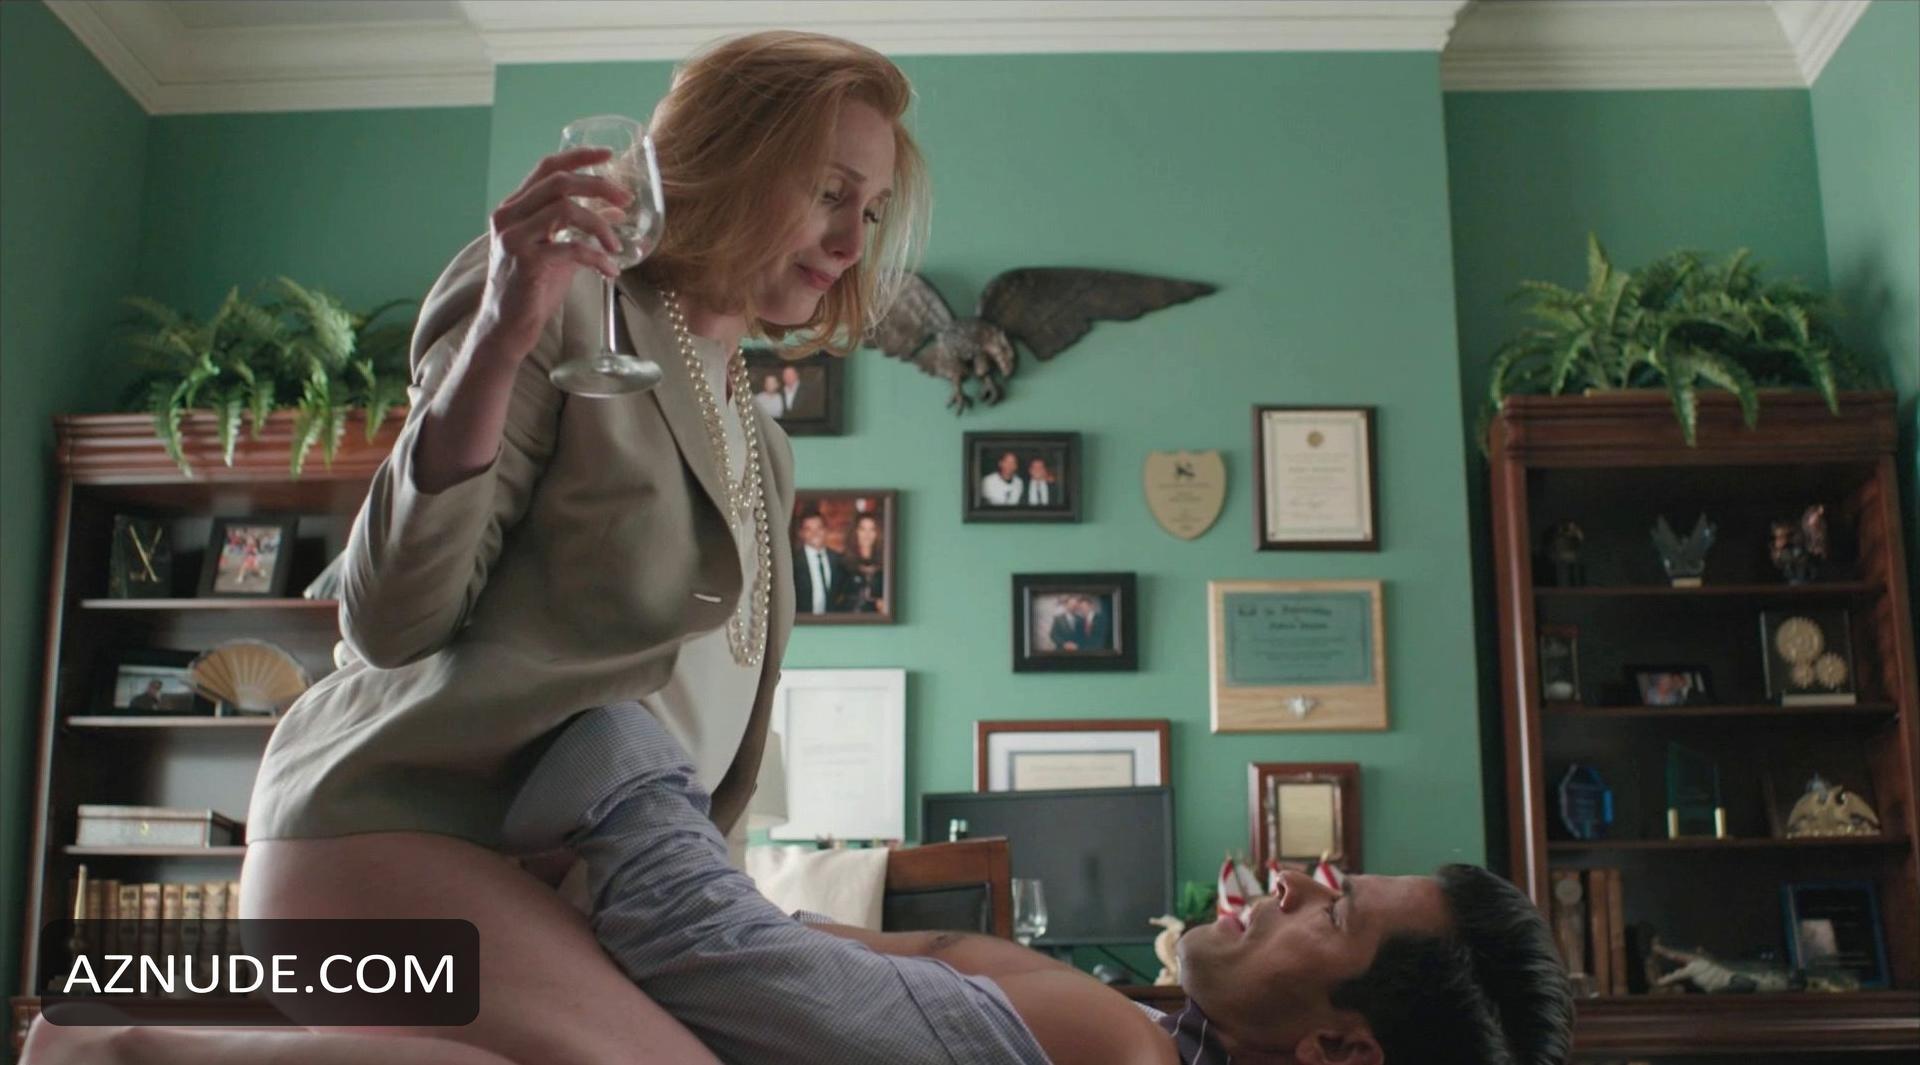 Kate mara house of cards s02e01 sex scene - 1 part 2